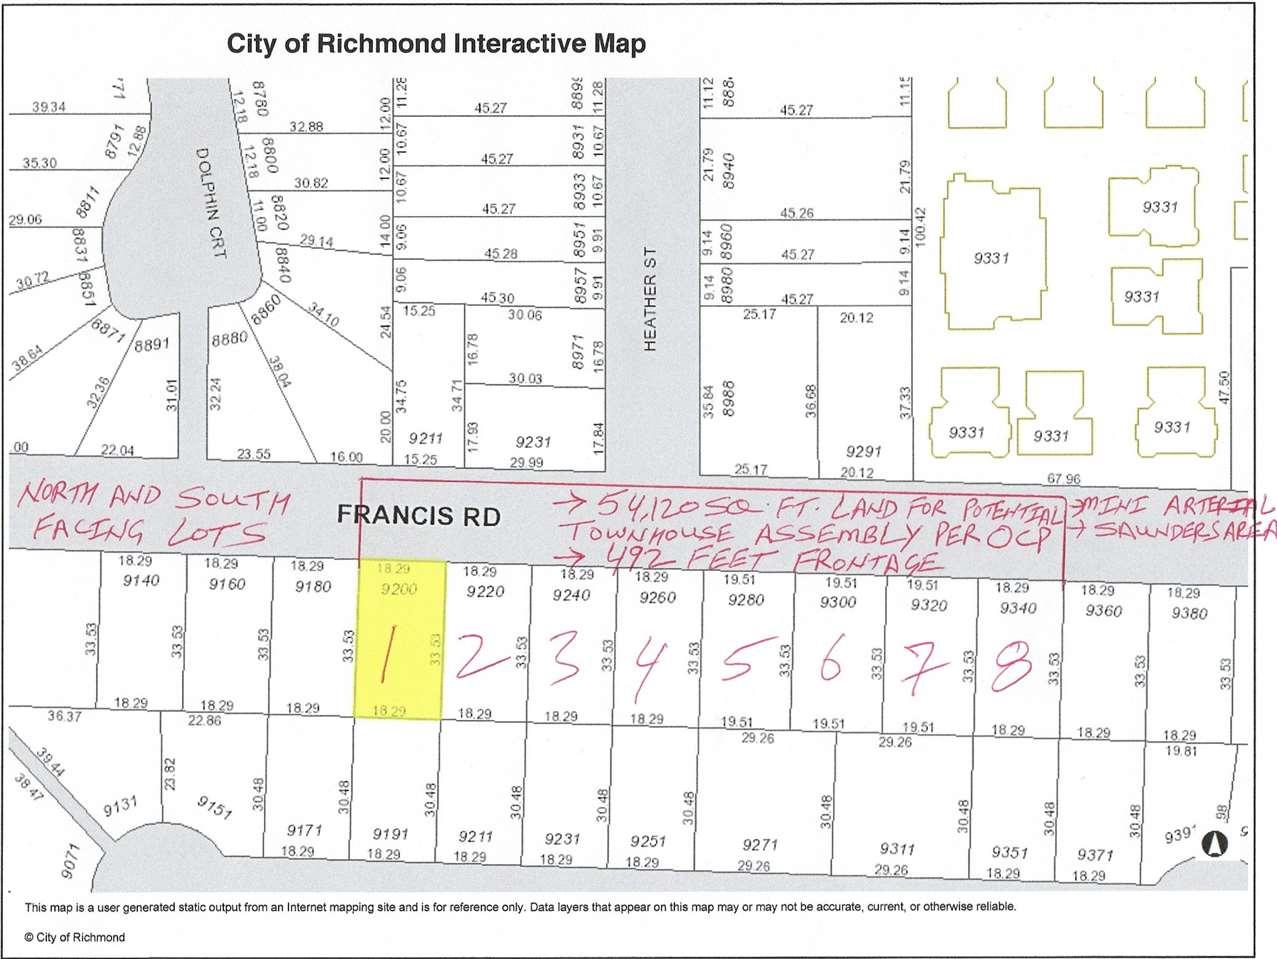 9220 FRANCIS ROAD, Richmond